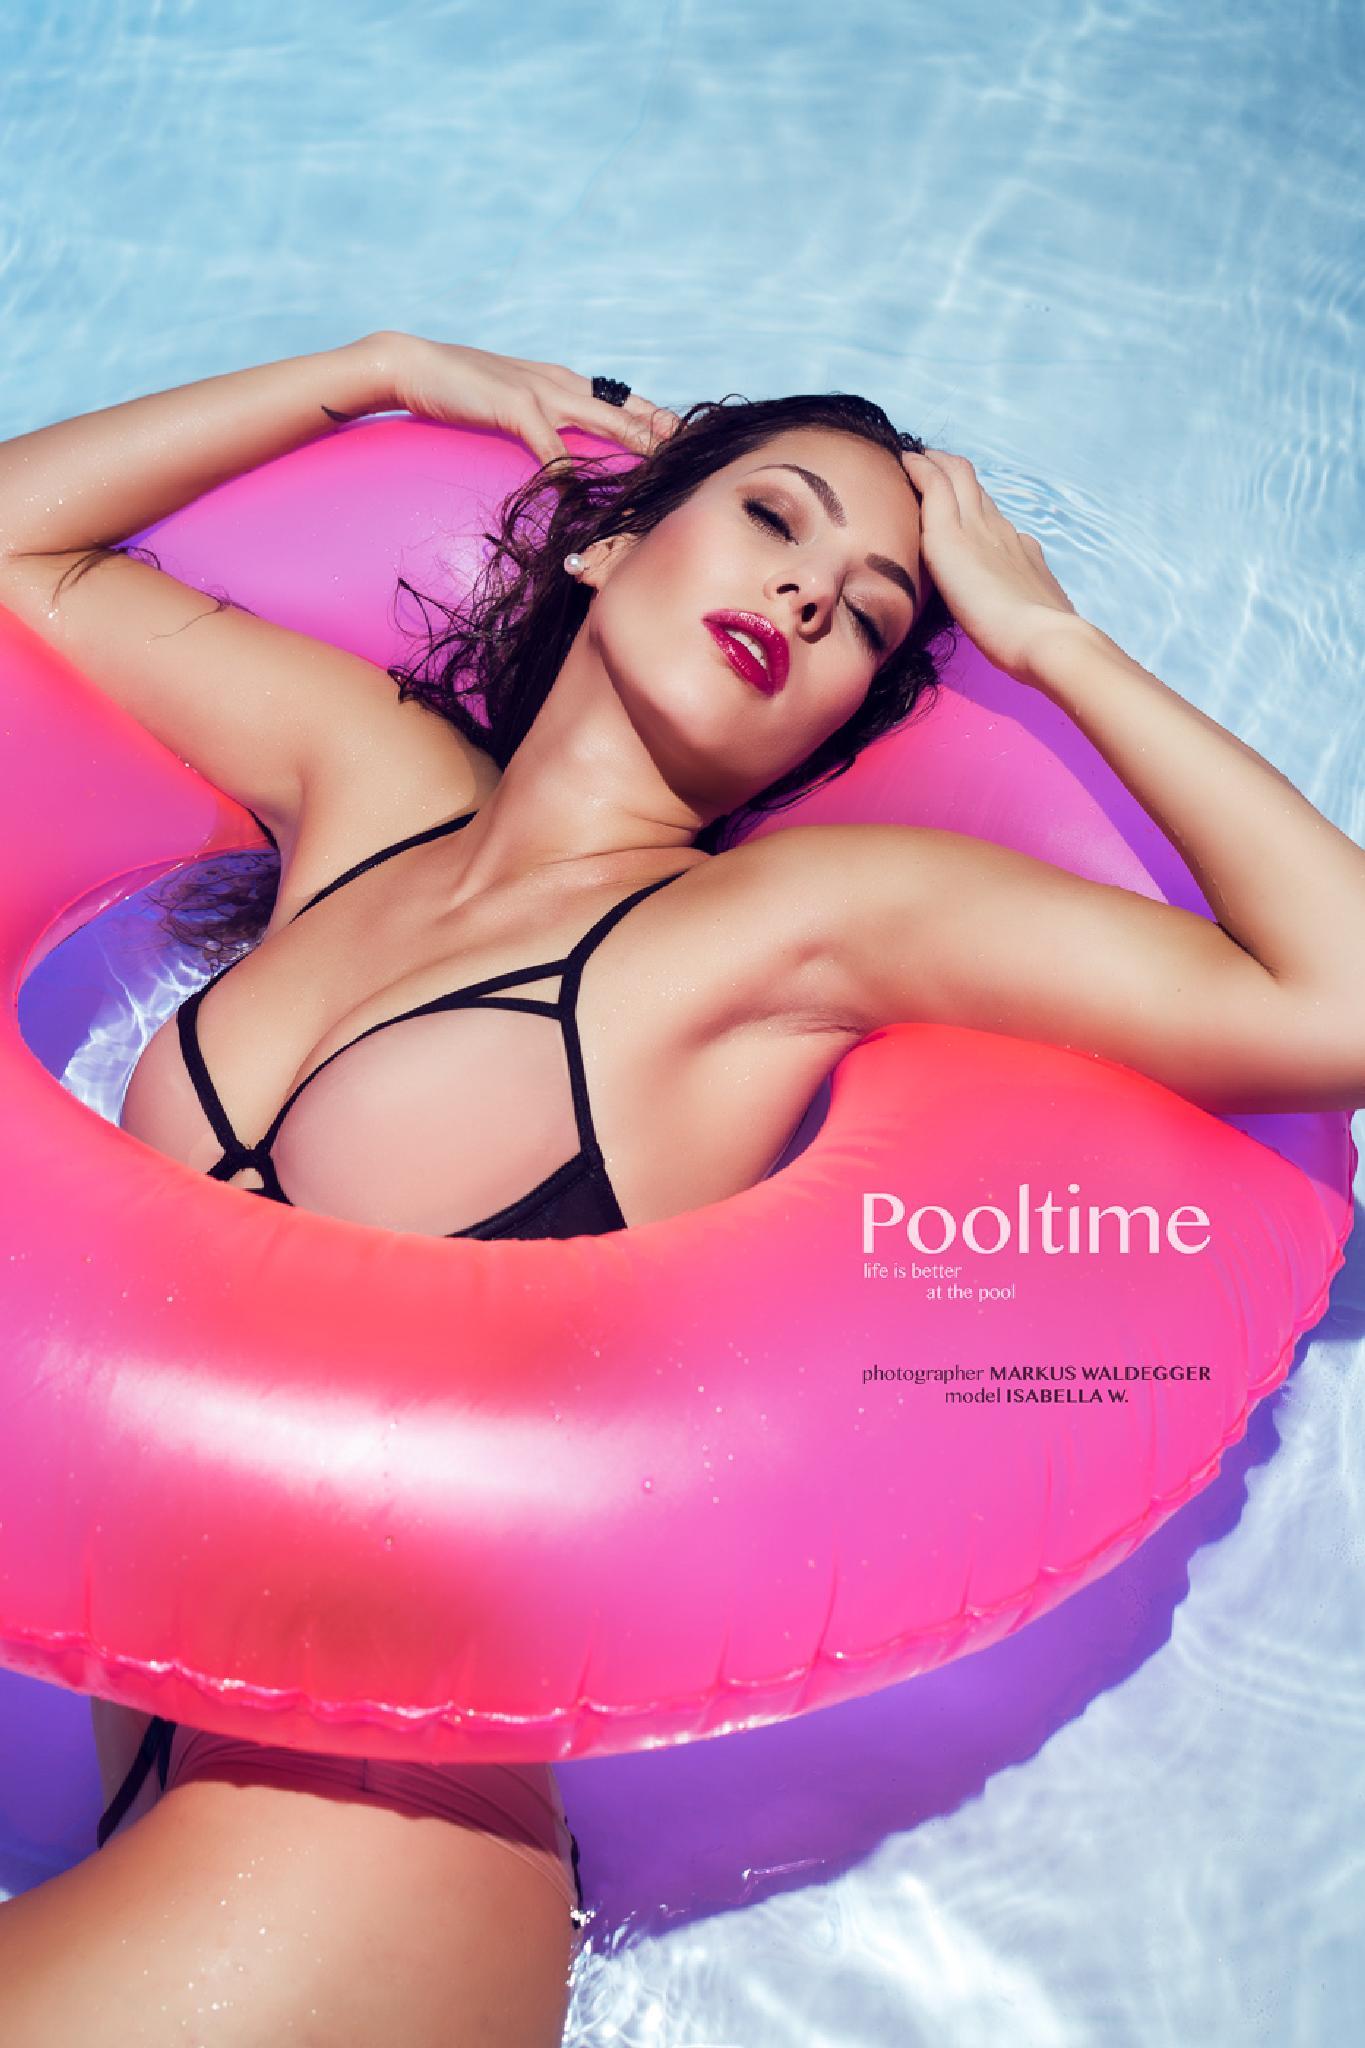 Pooltime by Markus Waldegger